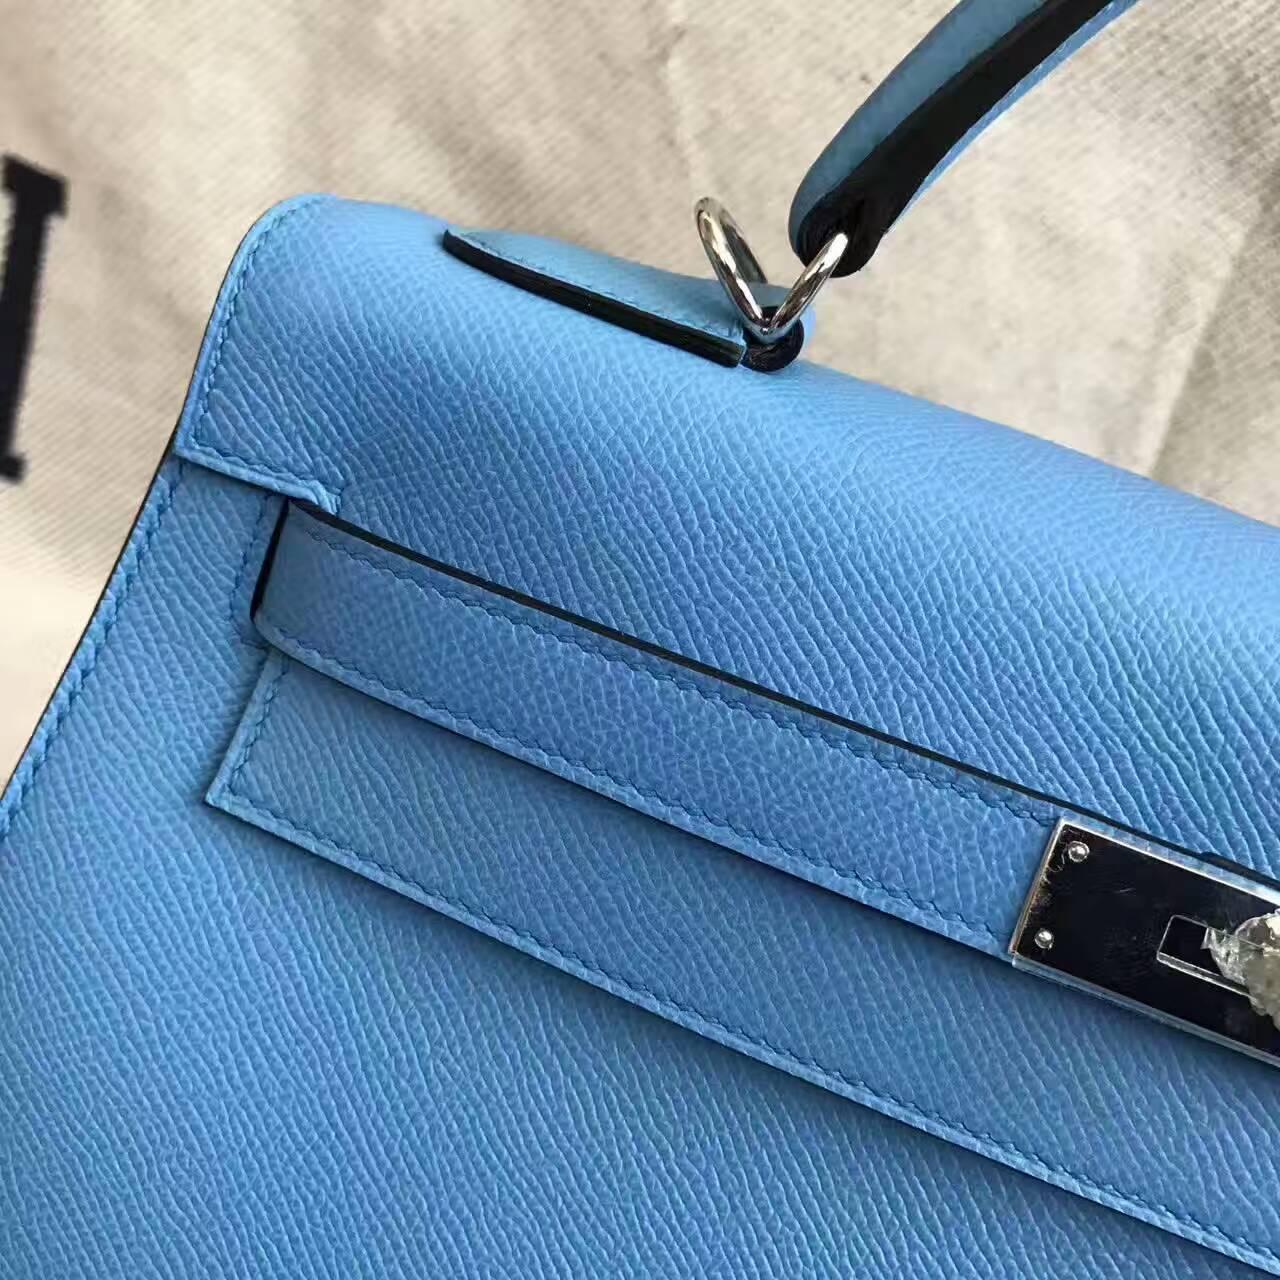 Wholesale Hermes Sellier Kelly Bag 32CM in 2T Blue Paradise Epsom Leather